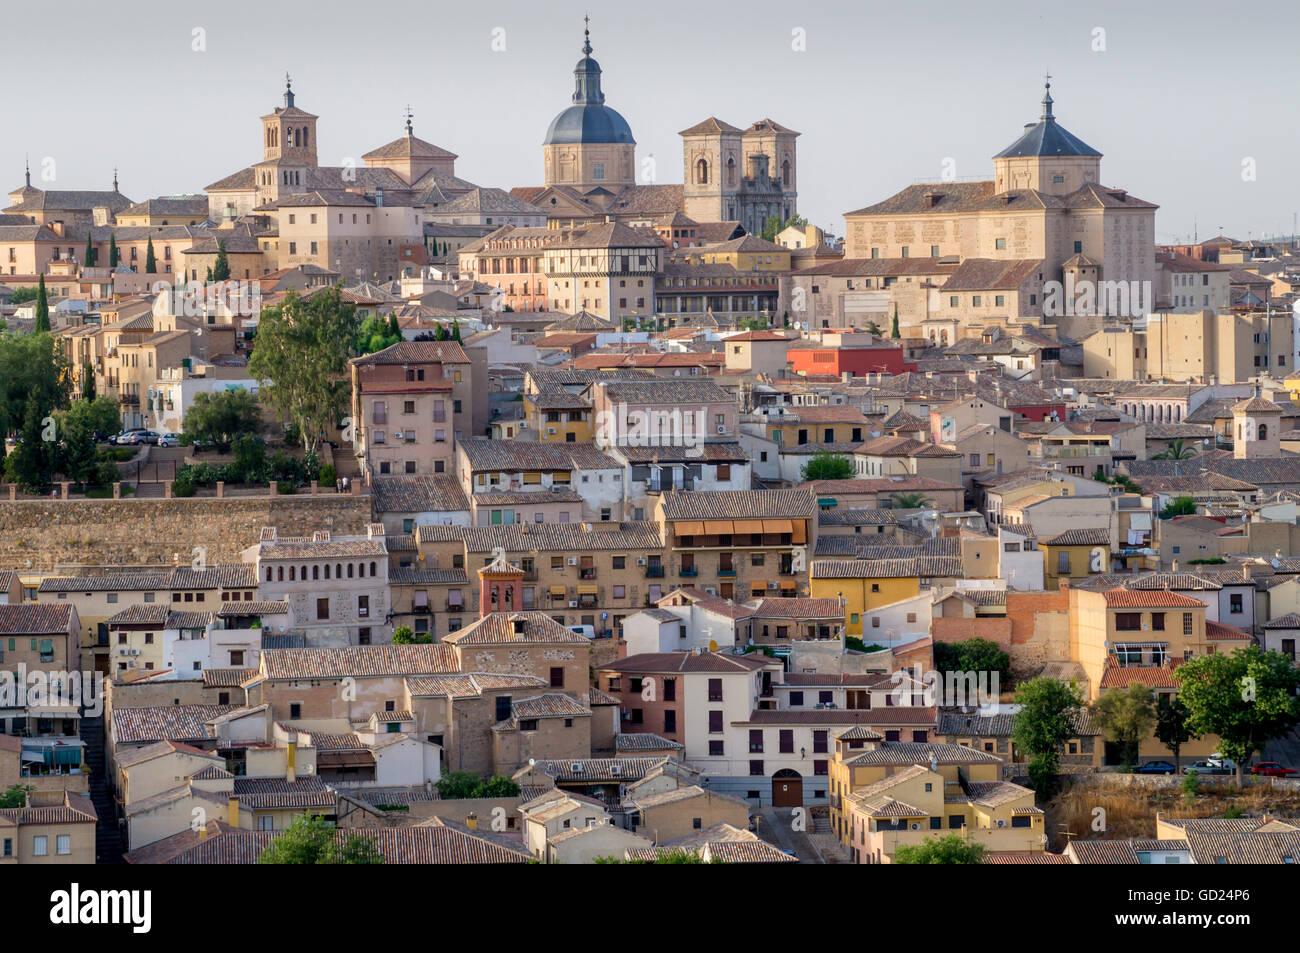 Cityscape, Toledo, Castile-La Mancha, Spain, Europe Stock Photo